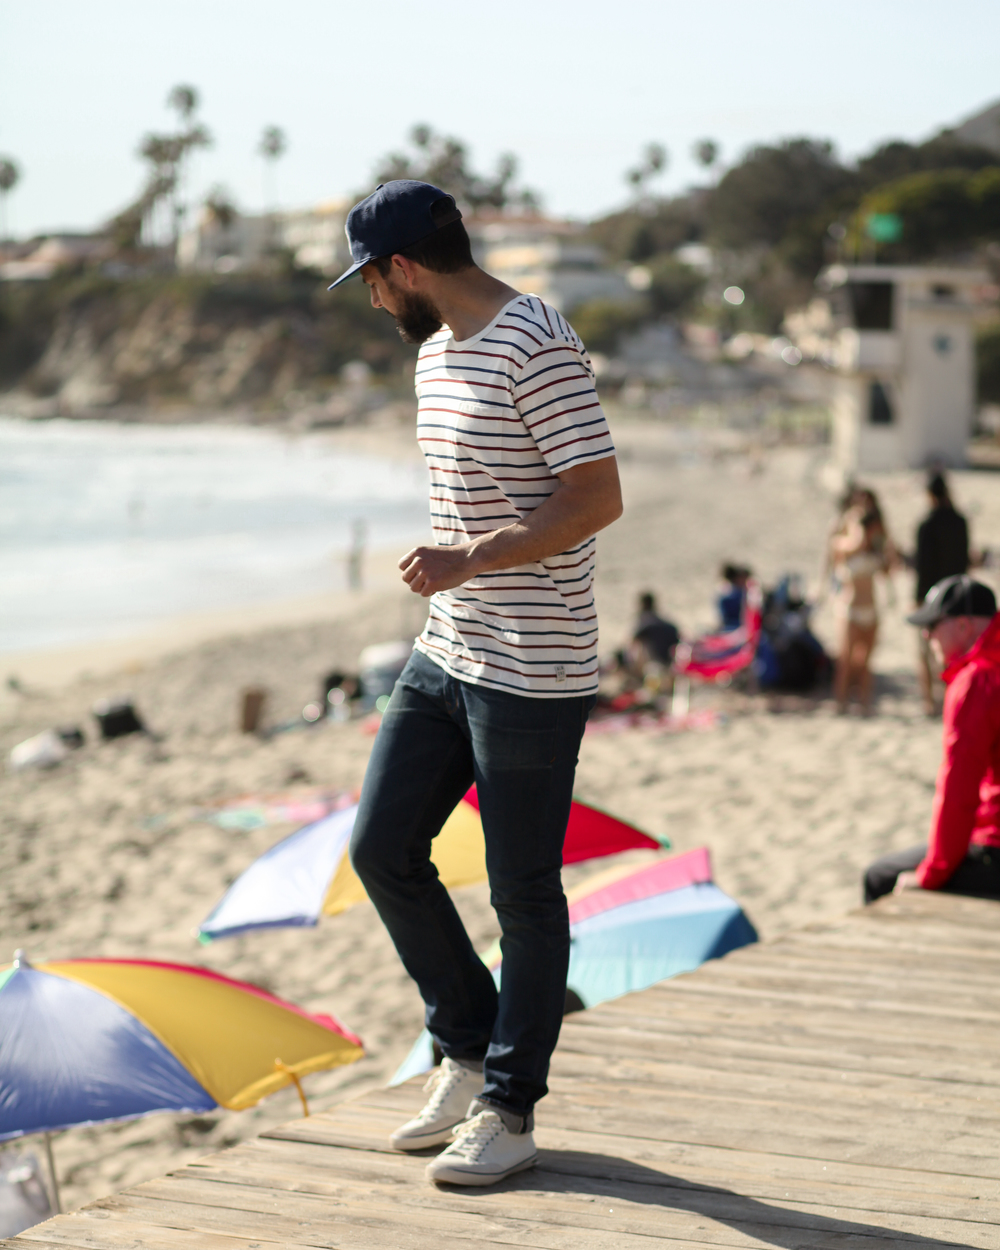 Ebbets Laguna Beach Ball Cap | Almond Westport Stripe Tee | Freenote Cloth 6 Month Wash Selvedge Denim | SeaVees Westwood Sneaker